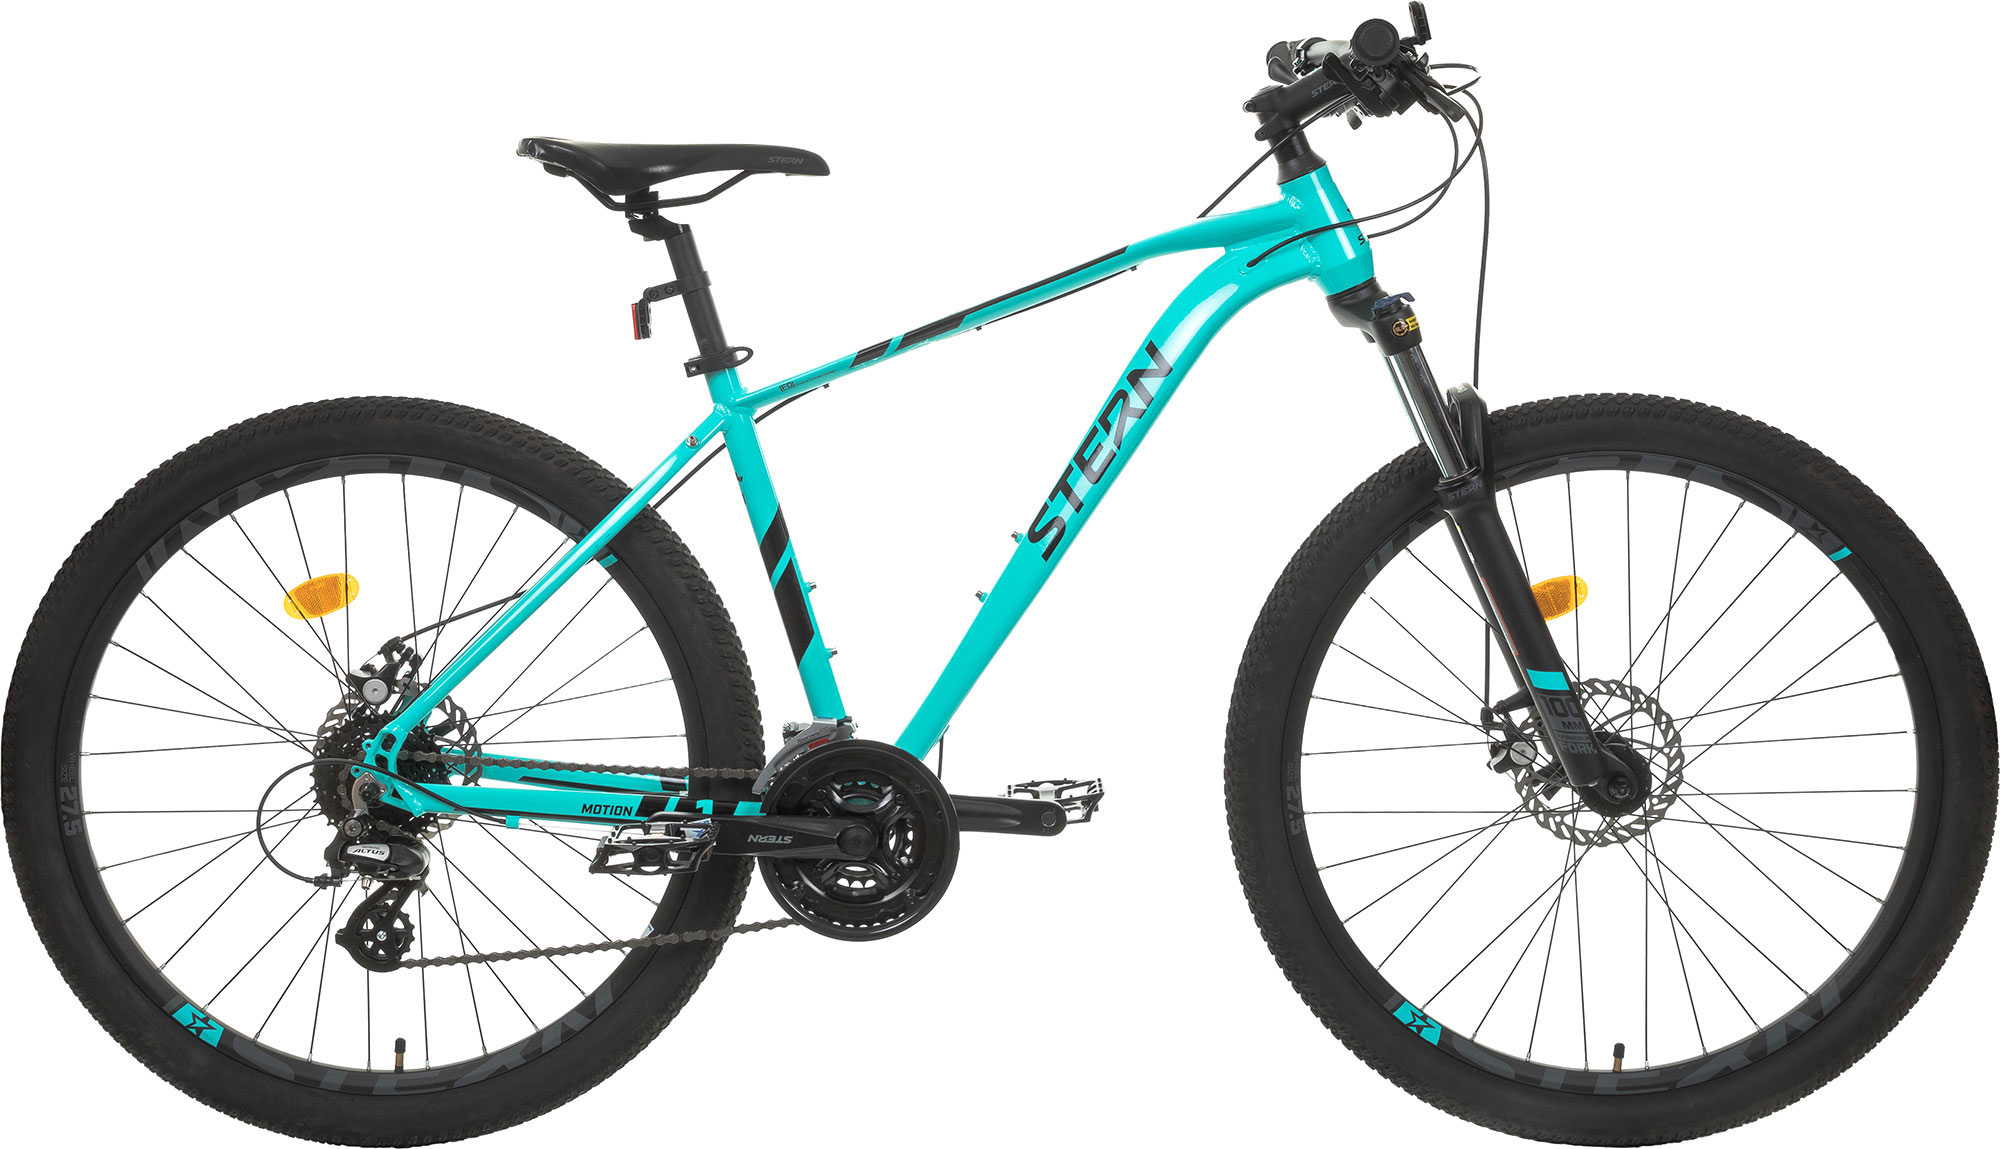 Stern Велосипед горный Motion 1.0 alt 27.5